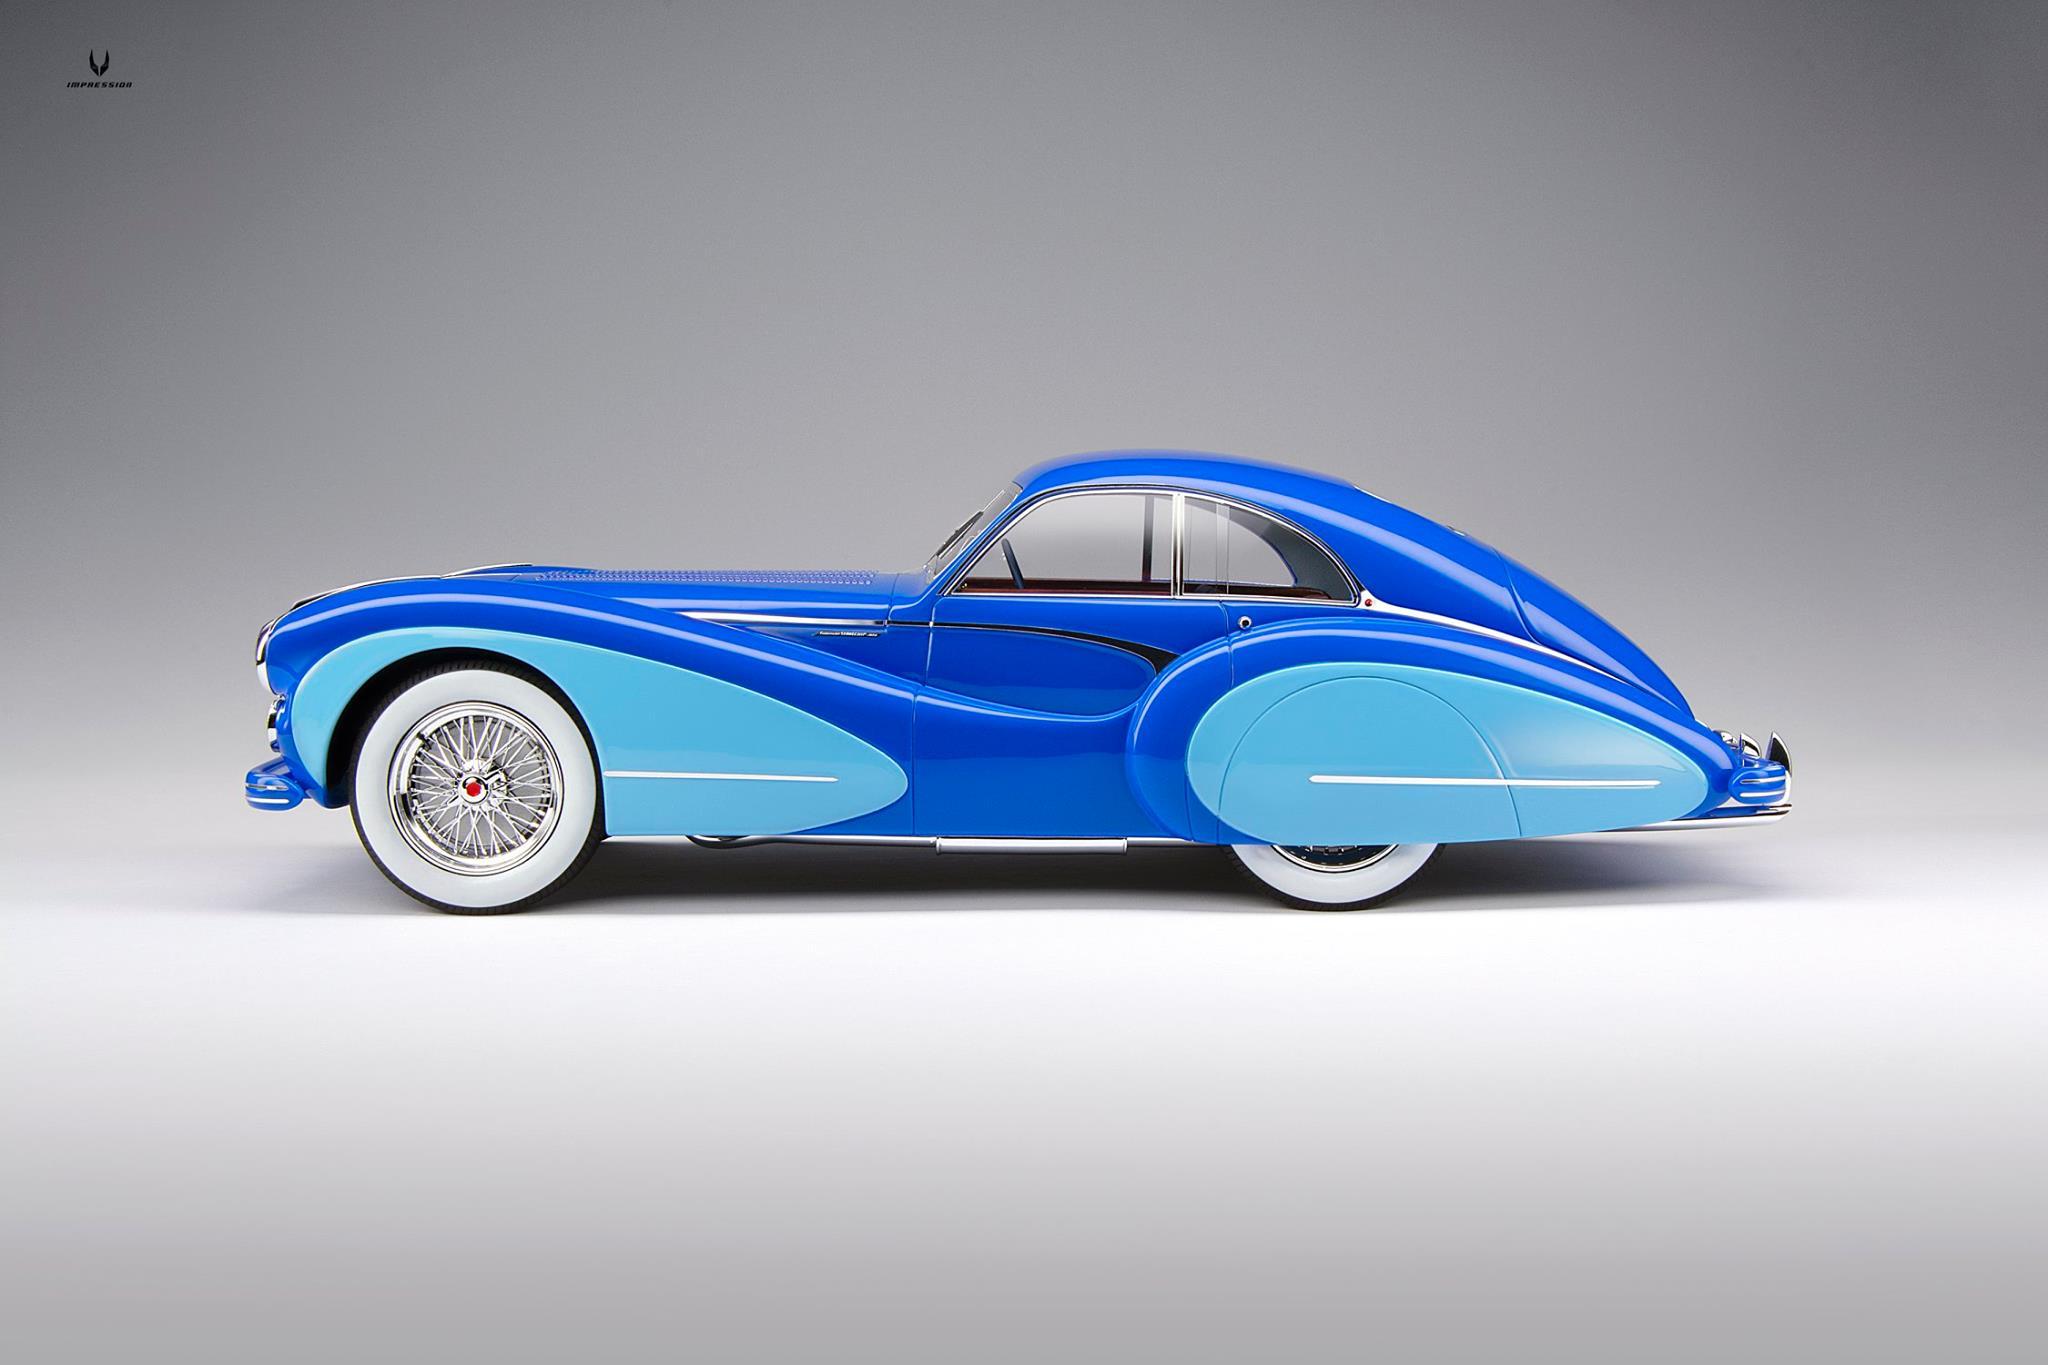 Talbot-Lago-T26-Grand-Sport-Coupe-Saoutchik-1948--1